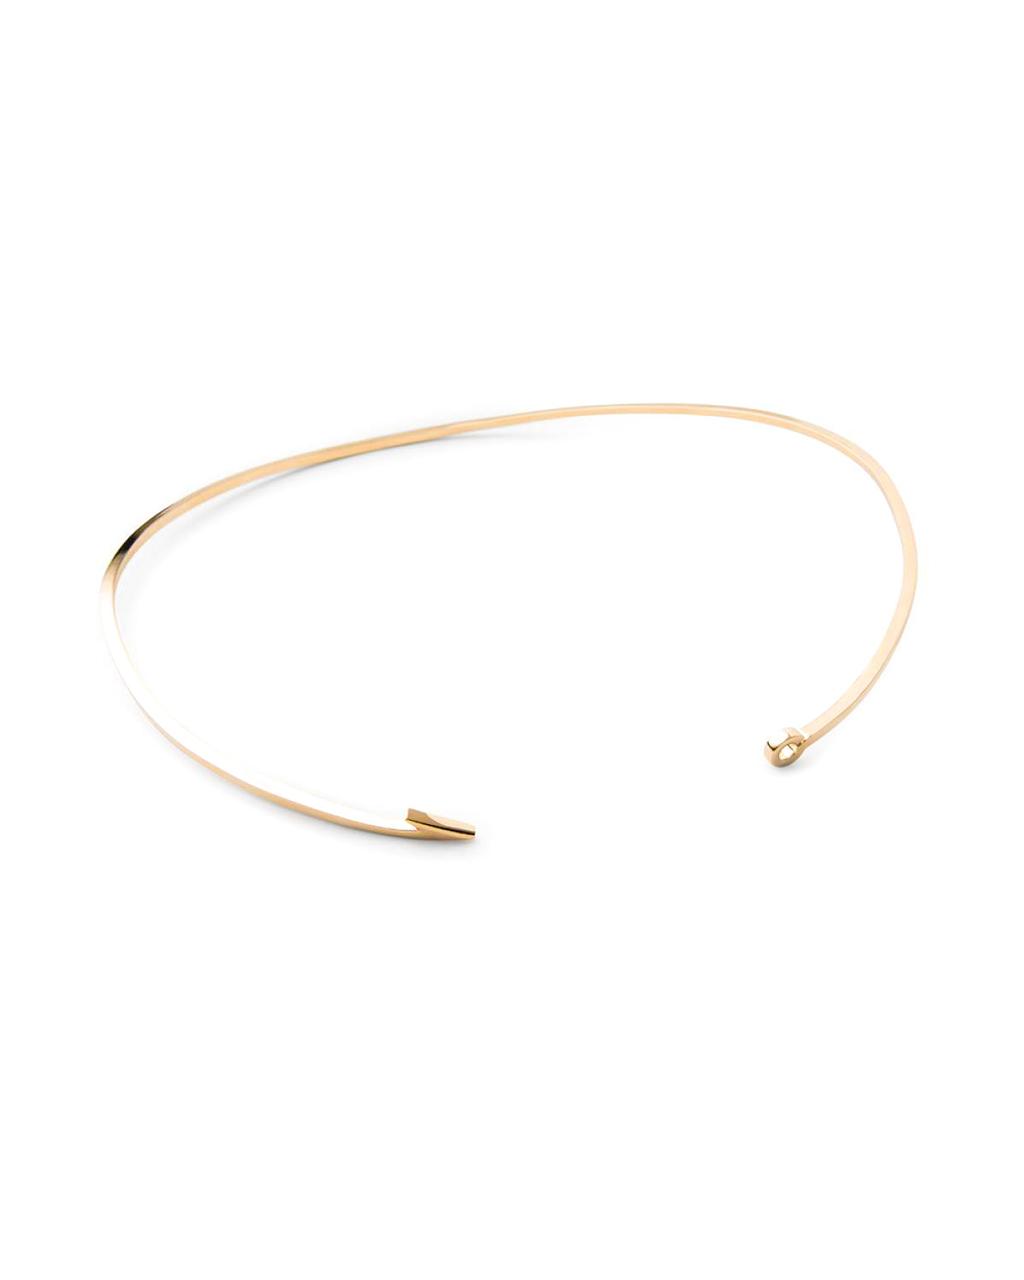 Miansai thin gold fish hook necklace garmentory for Gold fish hook necklace